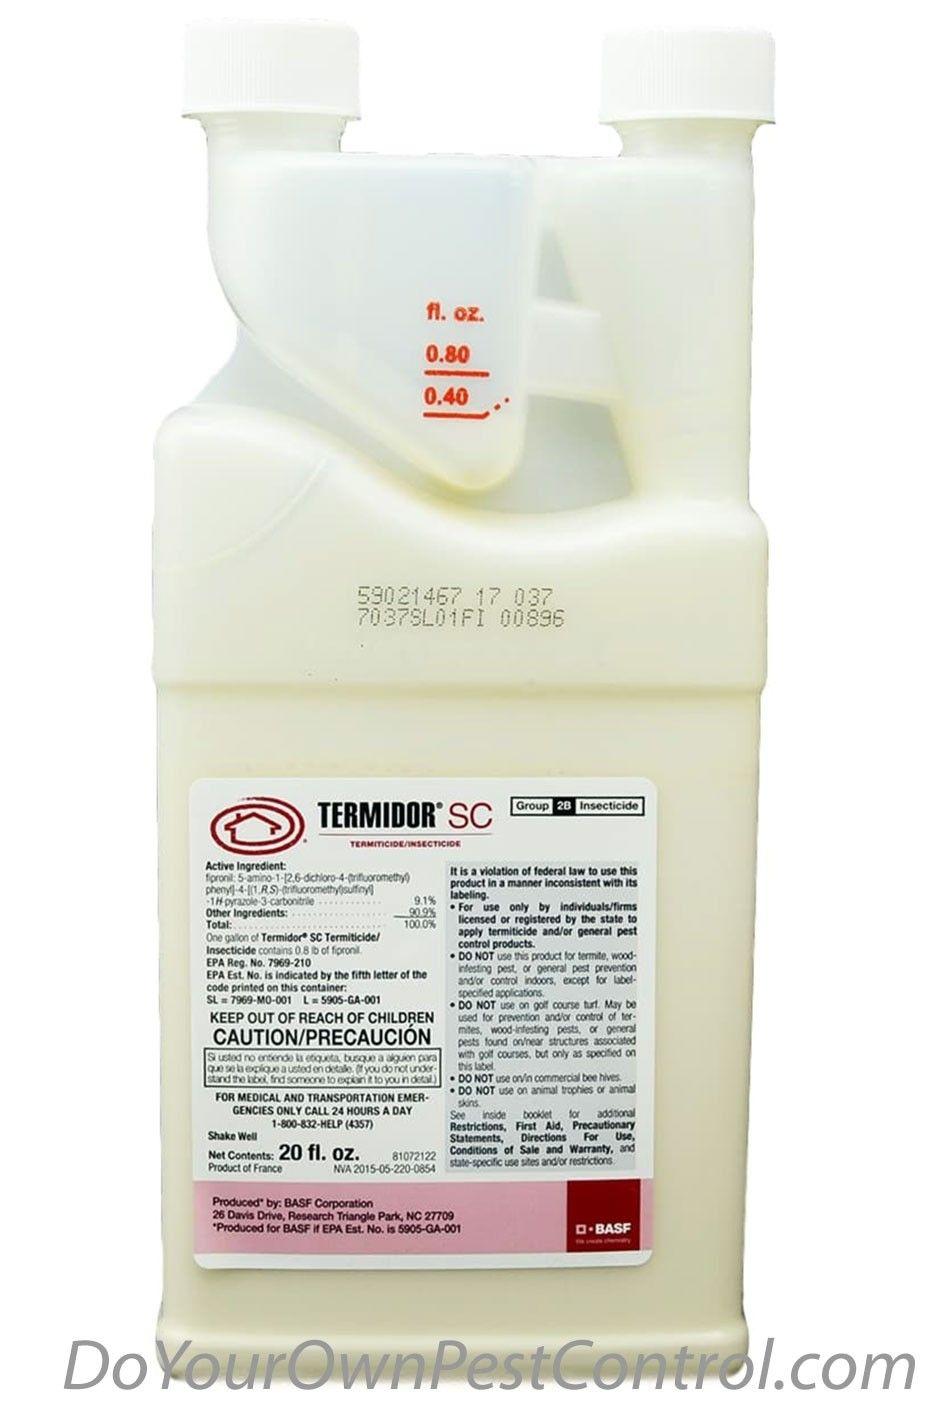 Termidor Sc In 2020 Termite Control Active Ingredient Insecticide